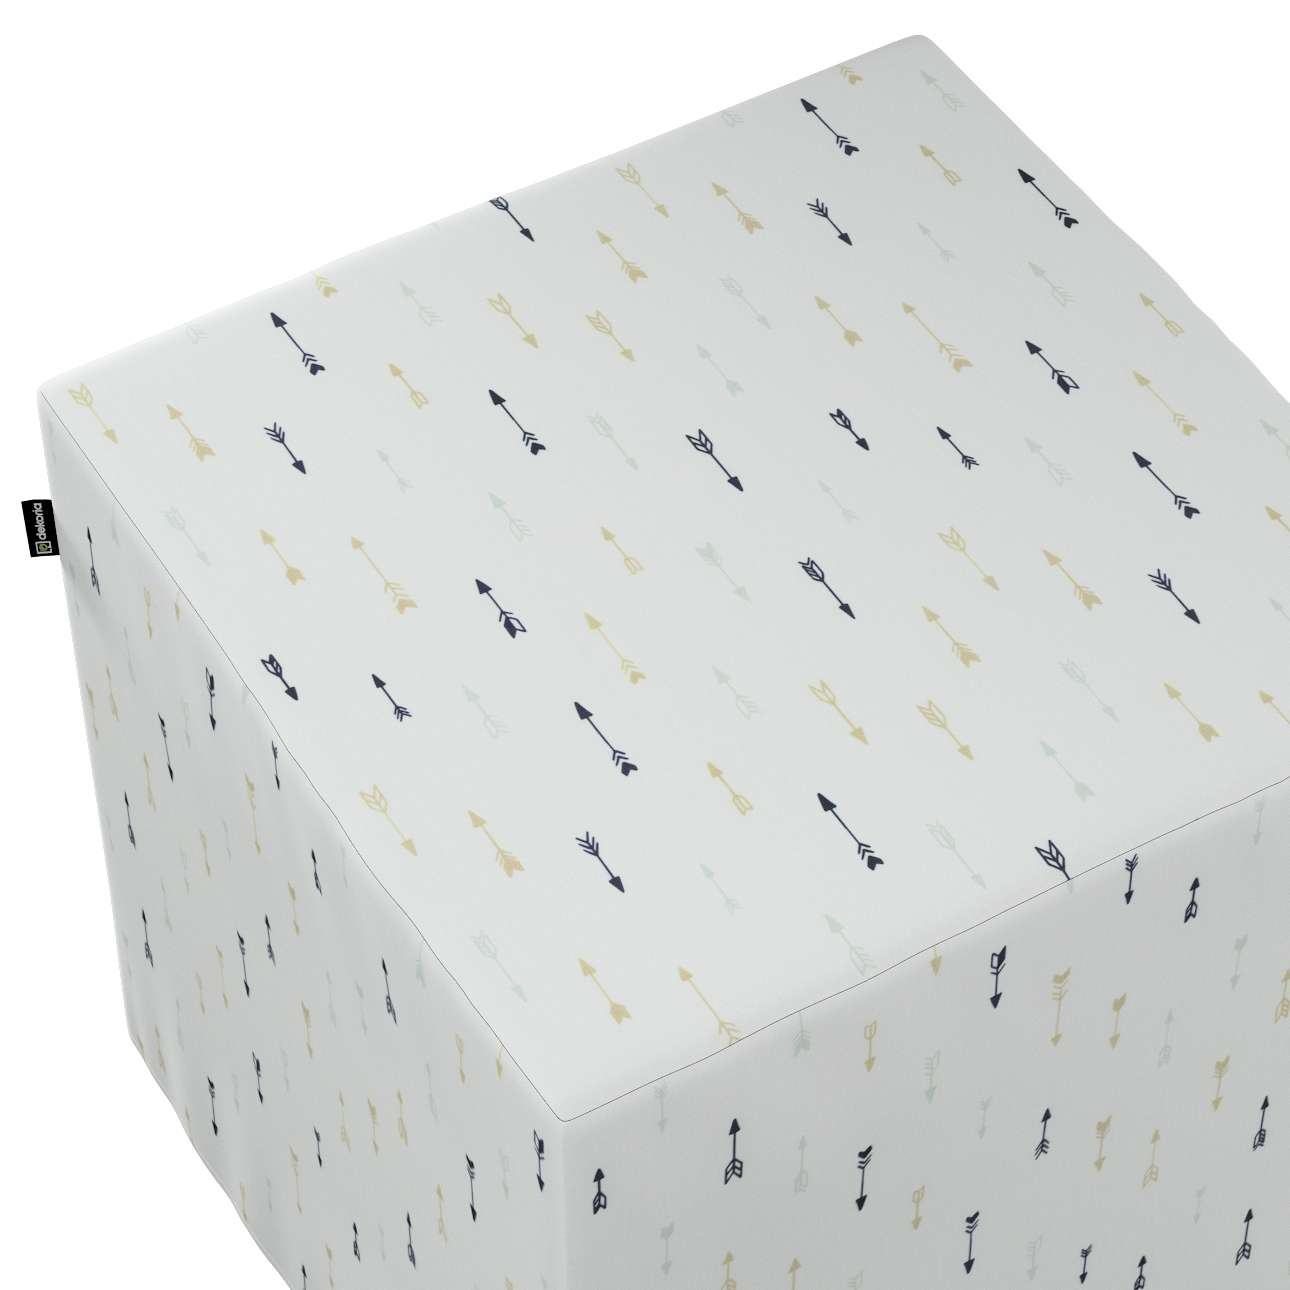 Pufa kostka w kolekcji Adventure, tkanina: 141-82